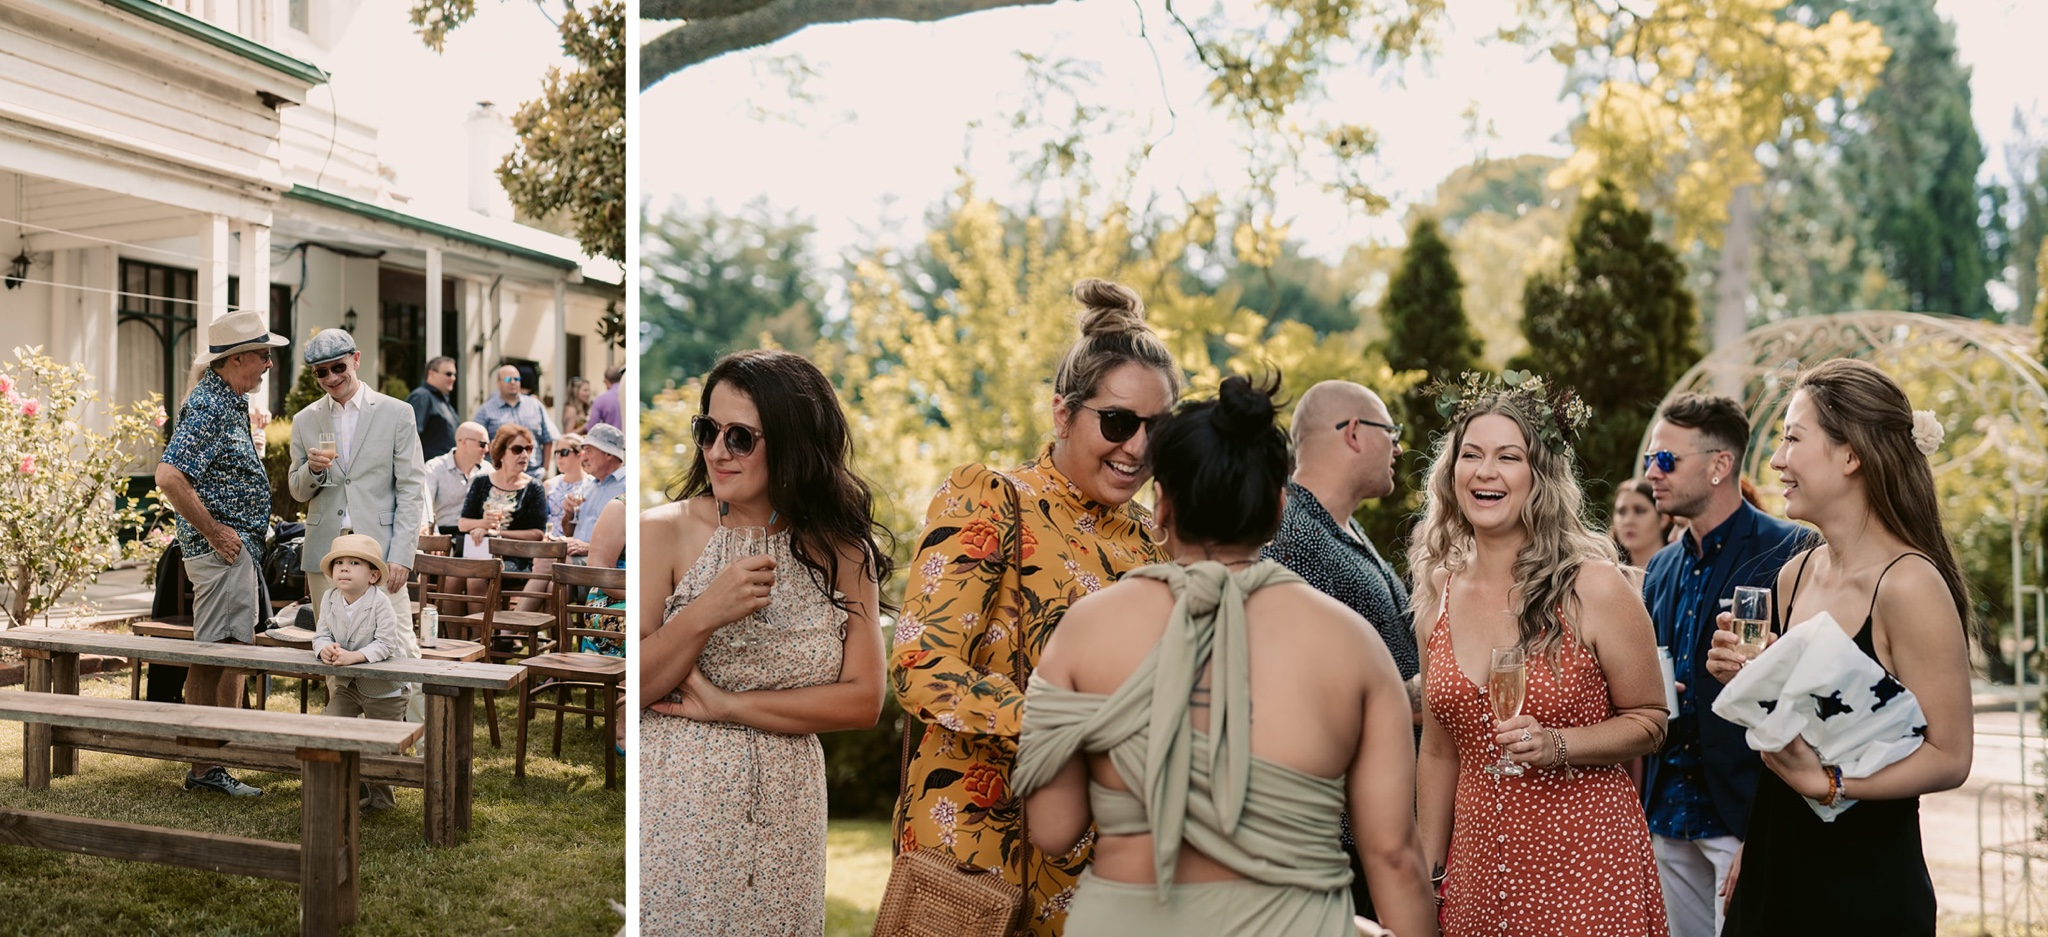 Wedstival Festival Wedding Photographer Yarra Valley56.jpg